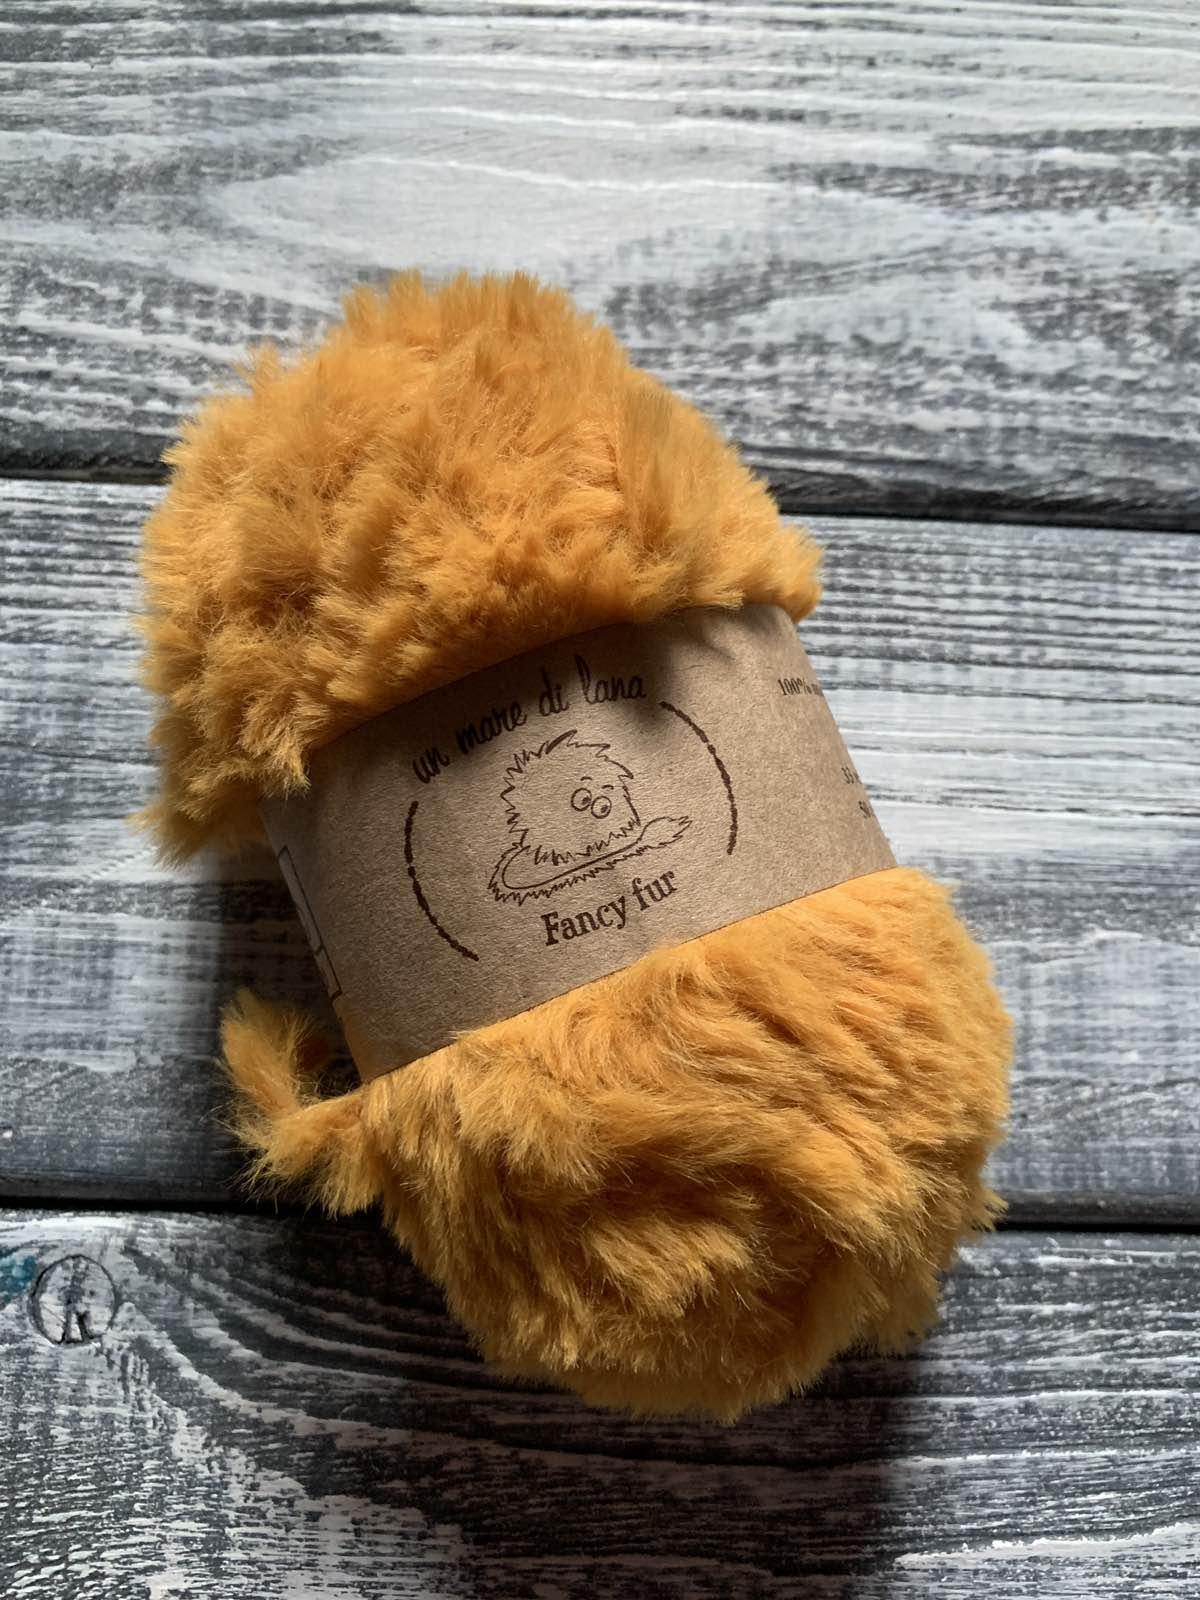 Wool Sea Fancy fur (Море шерсти Фанси фе ) 340 - листопад заказать в Беларуси со скидкой